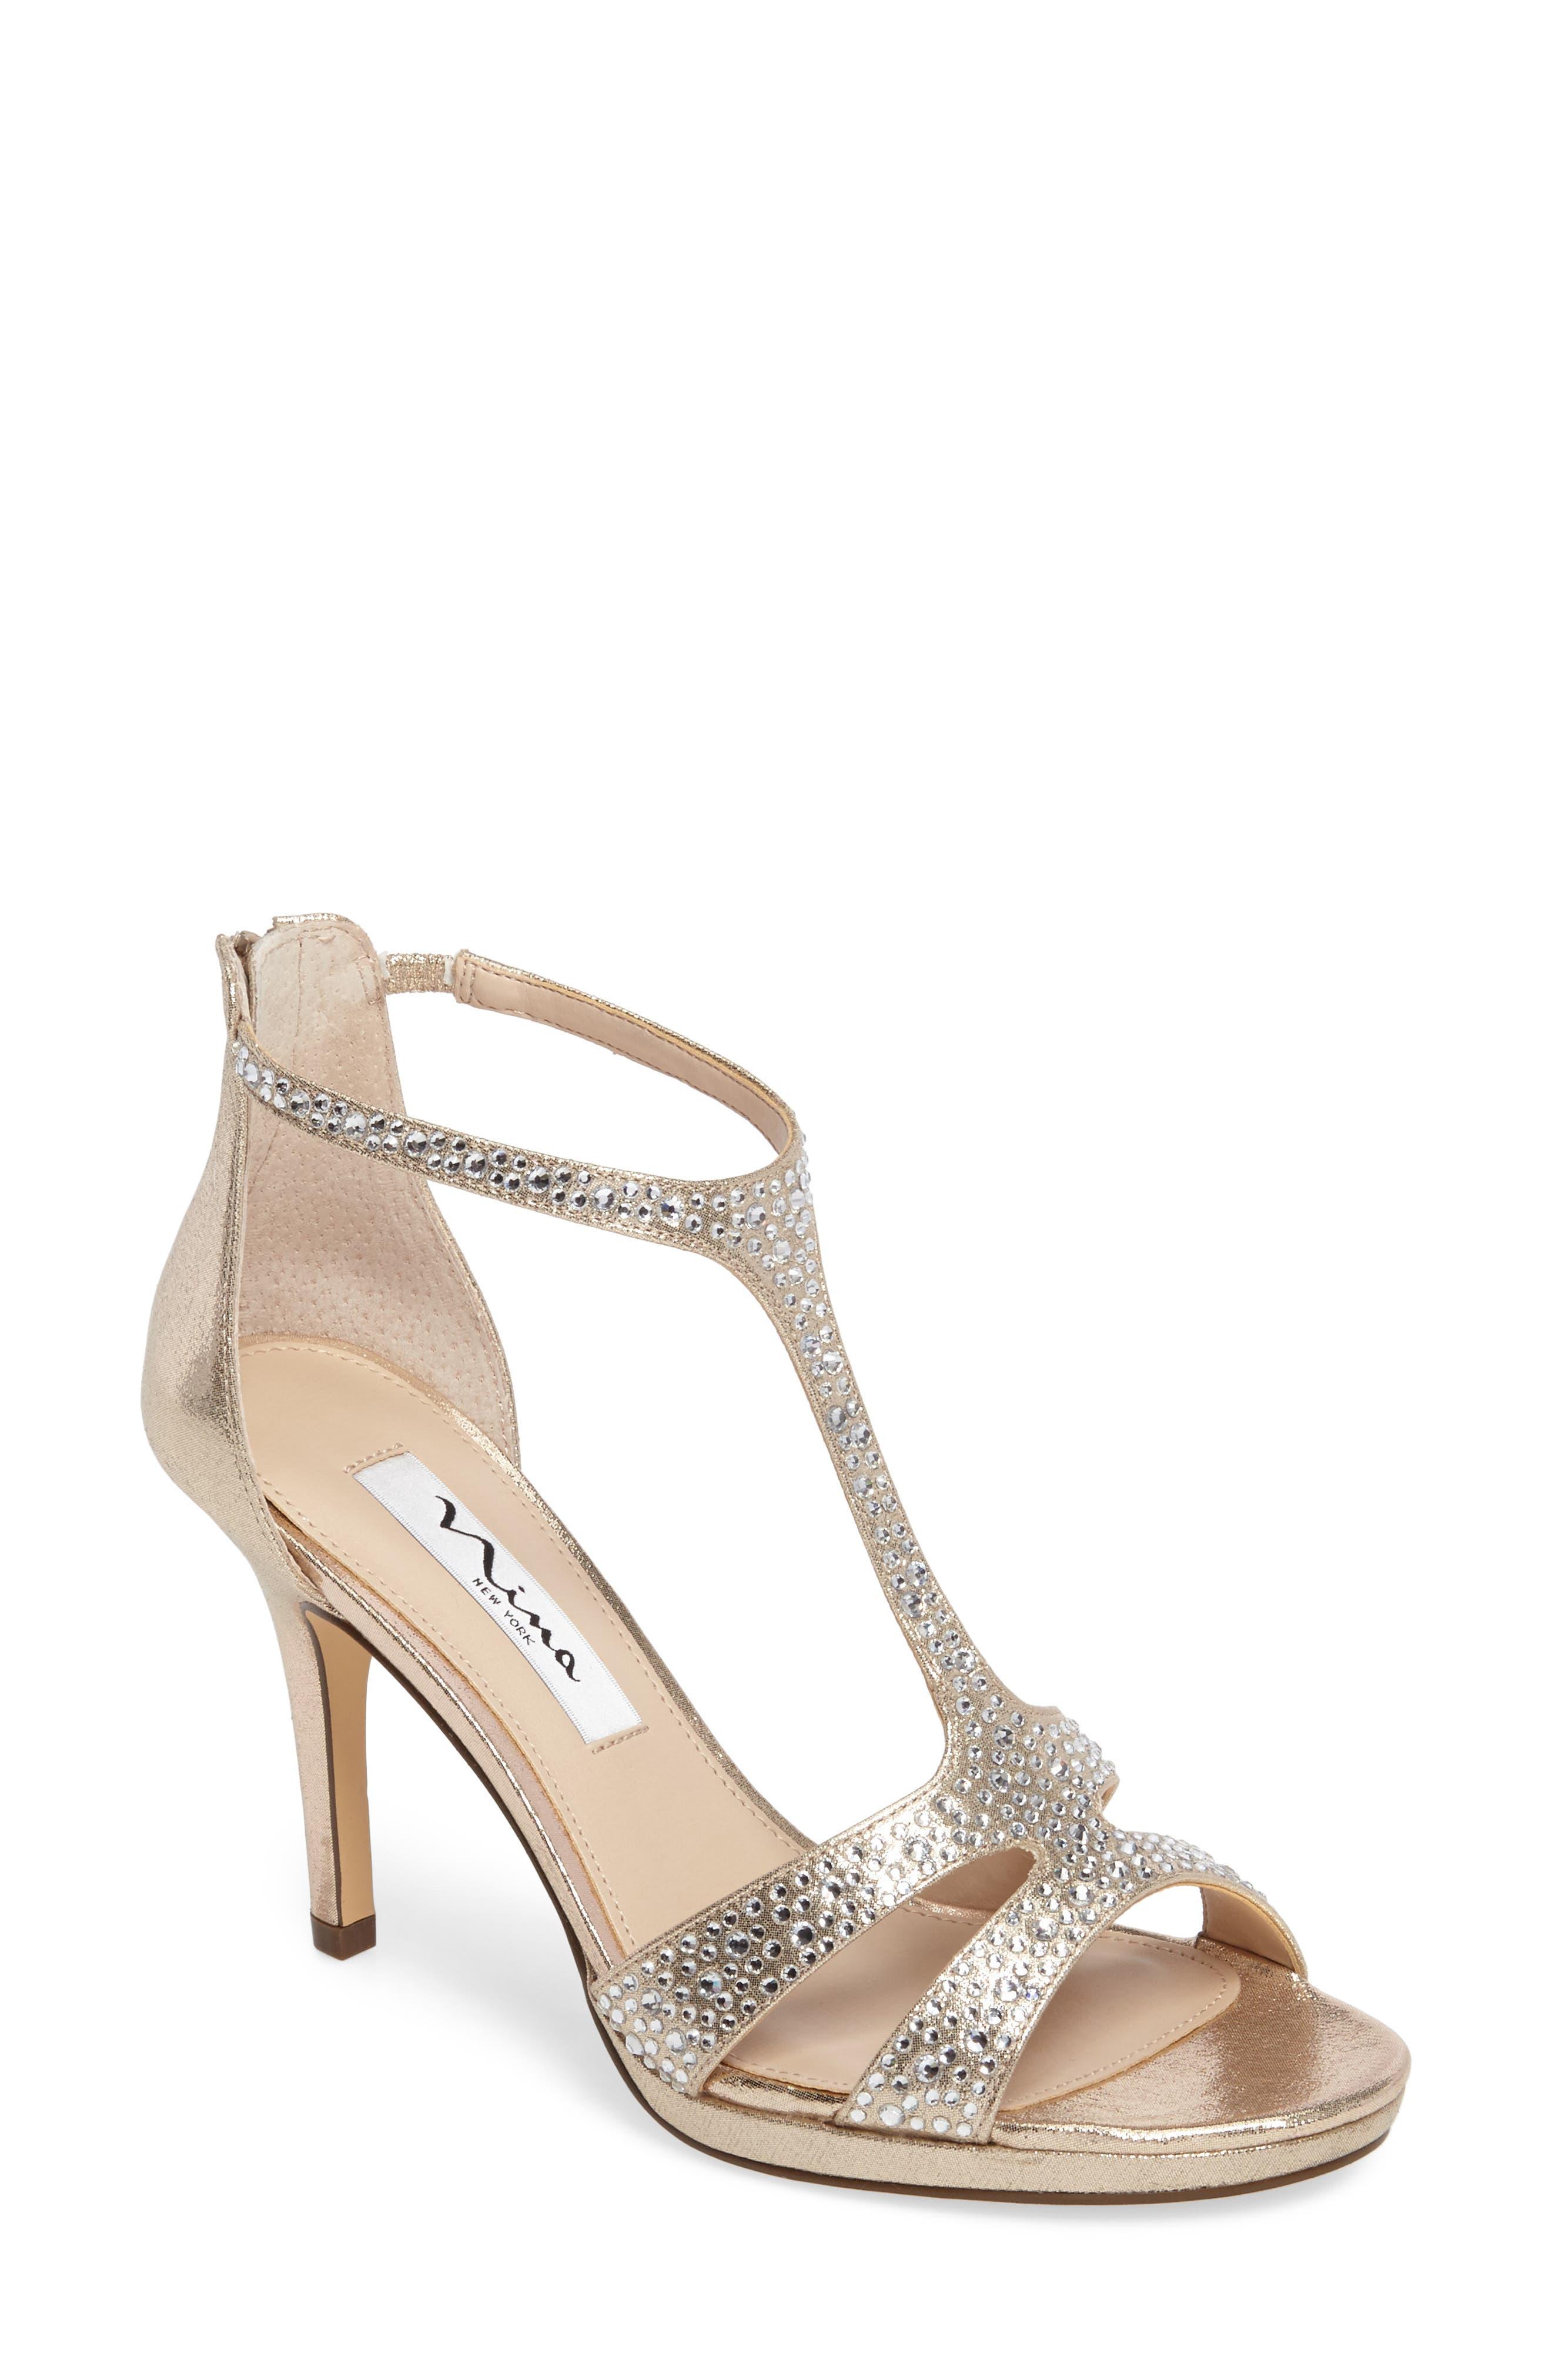 Main Image - Nina Brietta Embellished T-Strap Sandal (Women)